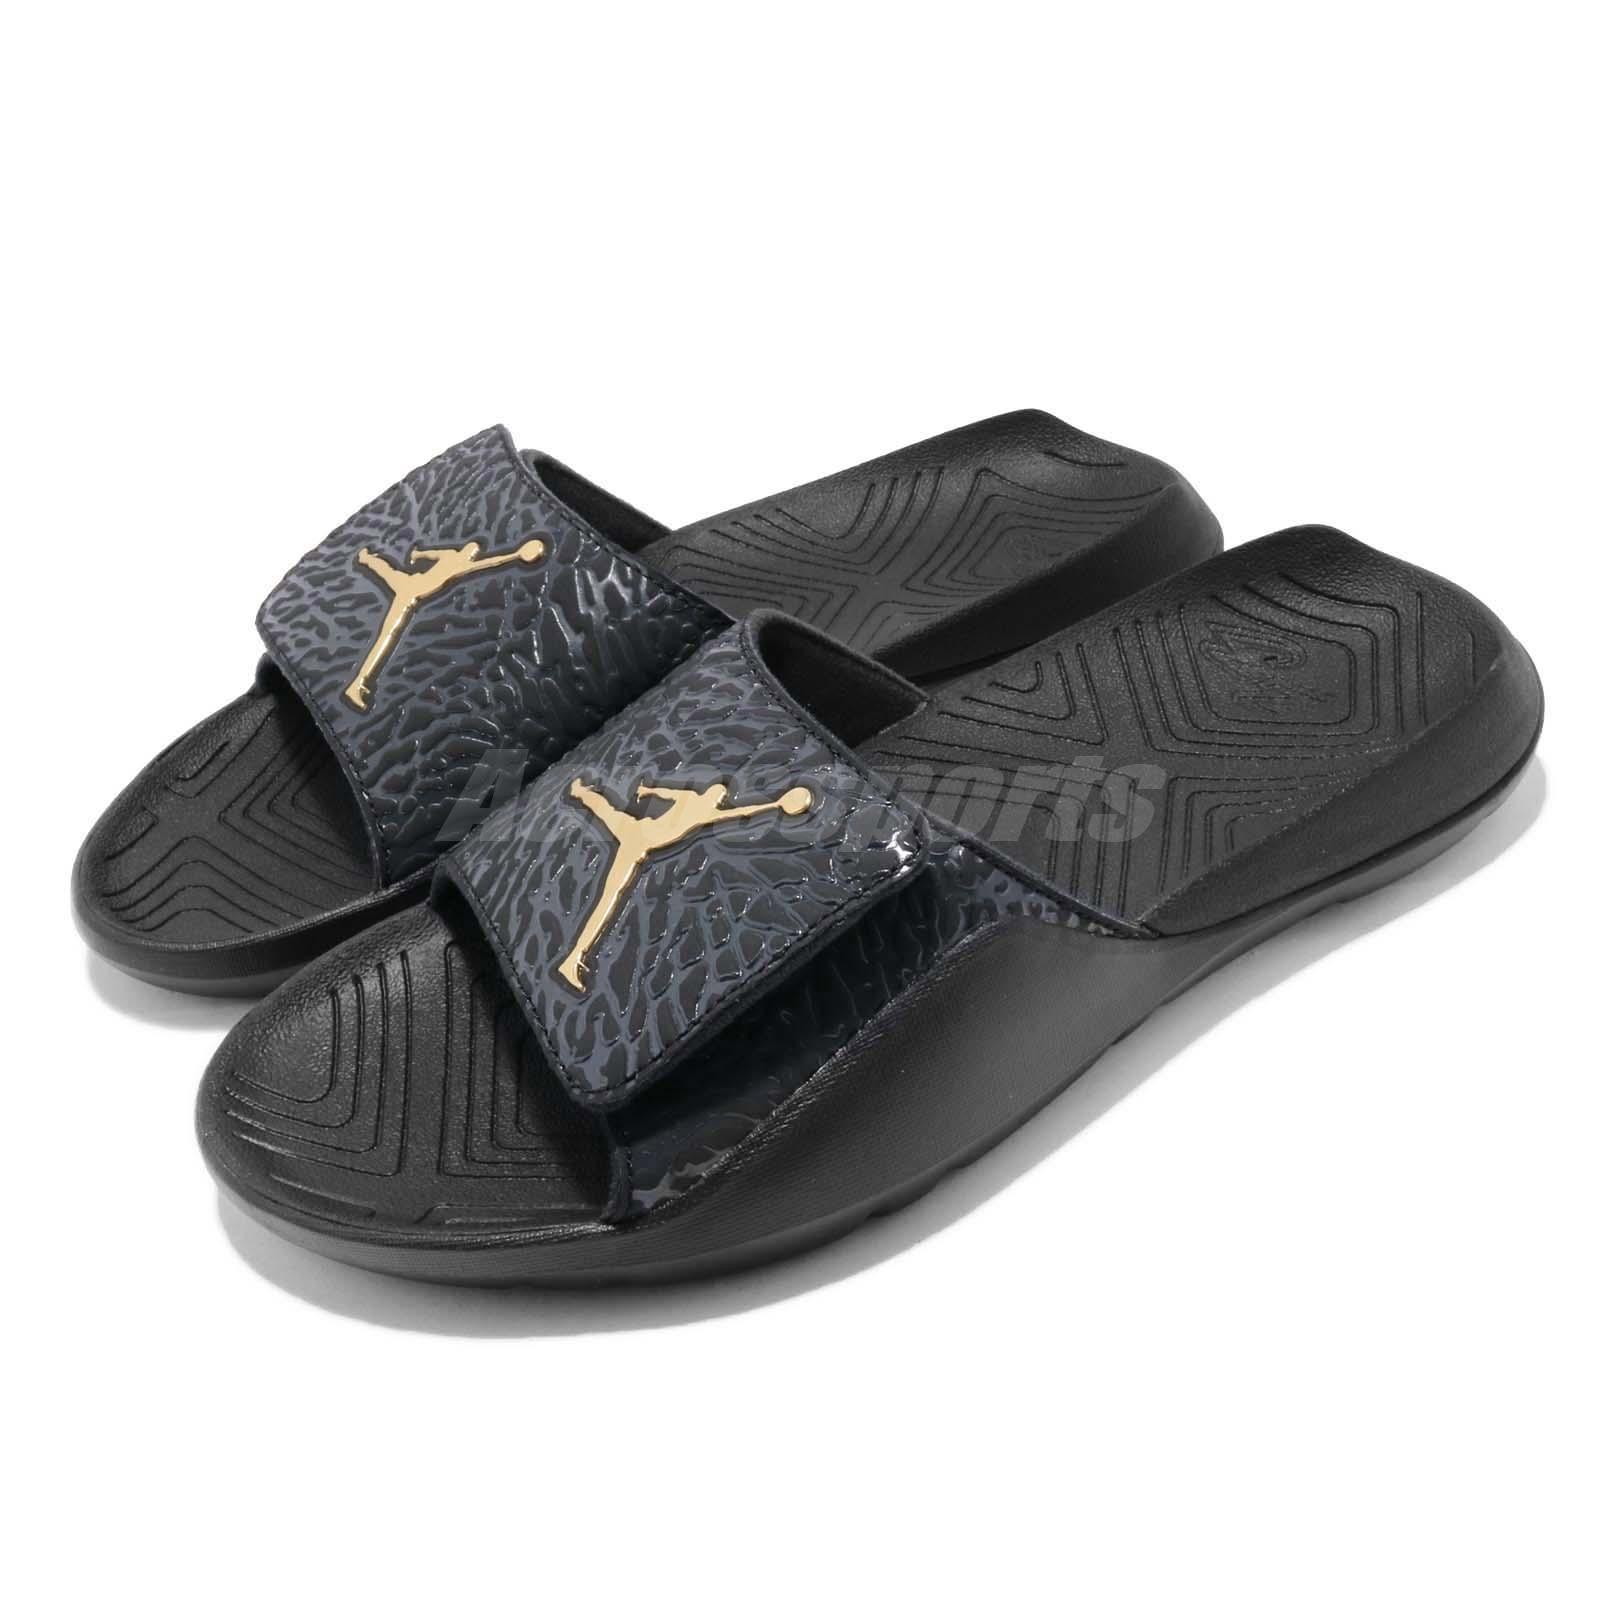 innovative design 67a12 1143e Details about Nike Jordan Hydro 7 V2 Black Gold Men Sports Sandals Slides  Slippers BQ6290-007